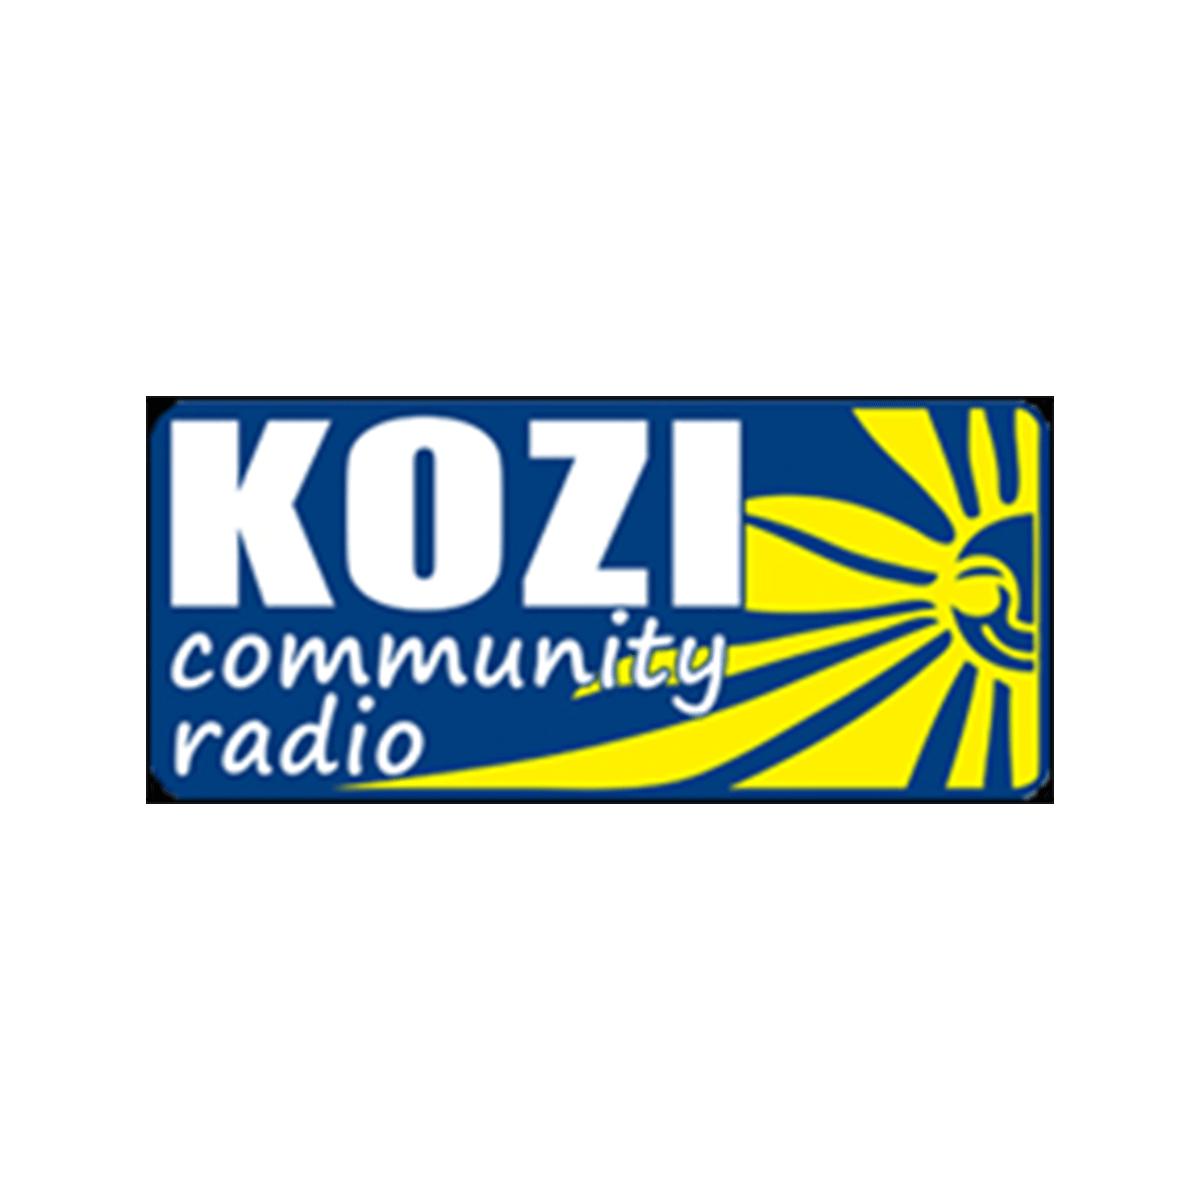 KOZI logo